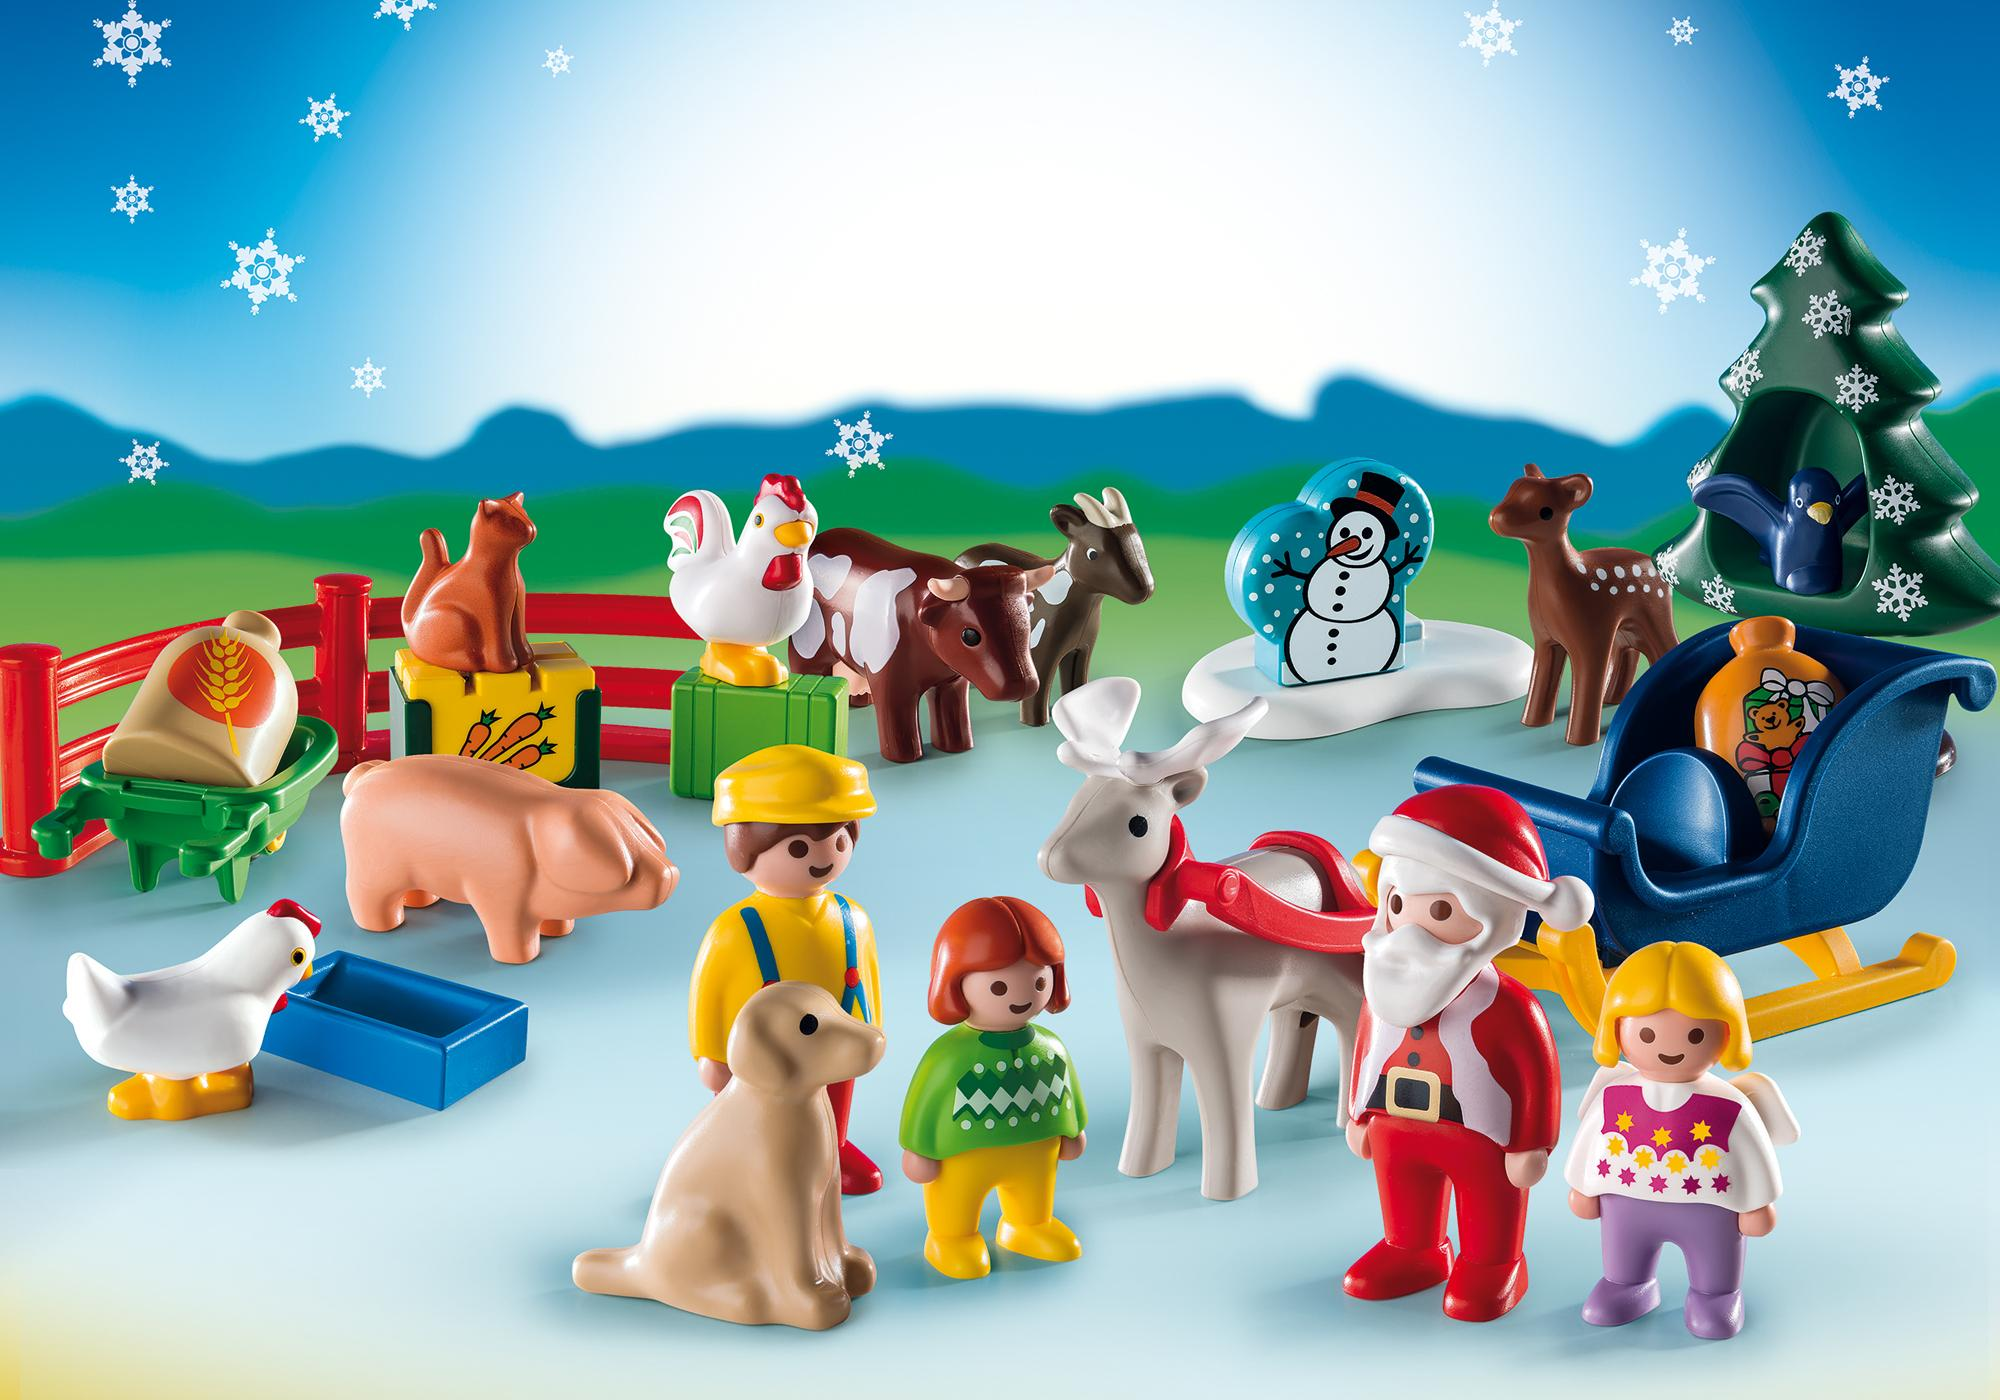 http://media.playmobil.com/i/playmobil/9009_product_extra1/1.2.3 Calendario de Navidad - Granja de Animales